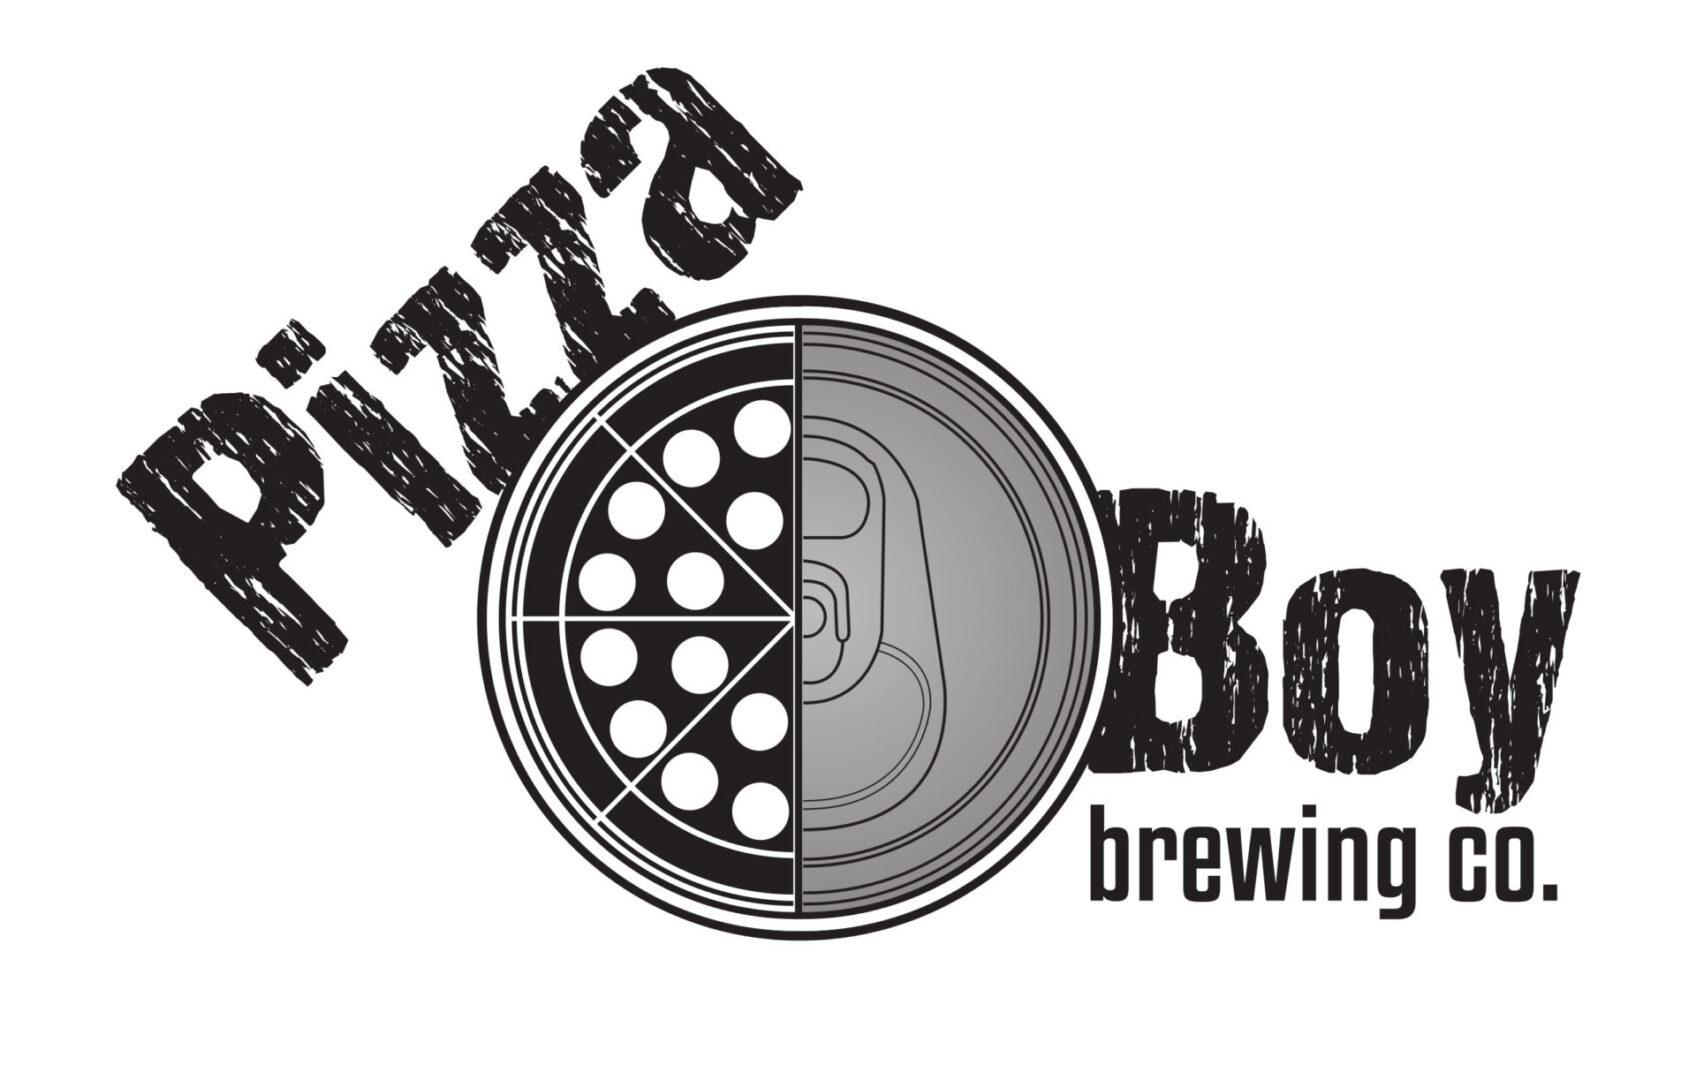 https://secureservercdn.net/198.71.233.197/ejs.c25.myftpupload.com/wp-content/uploads/2020/02/logo-pizza_boy_brewing-1-scaled.jpg